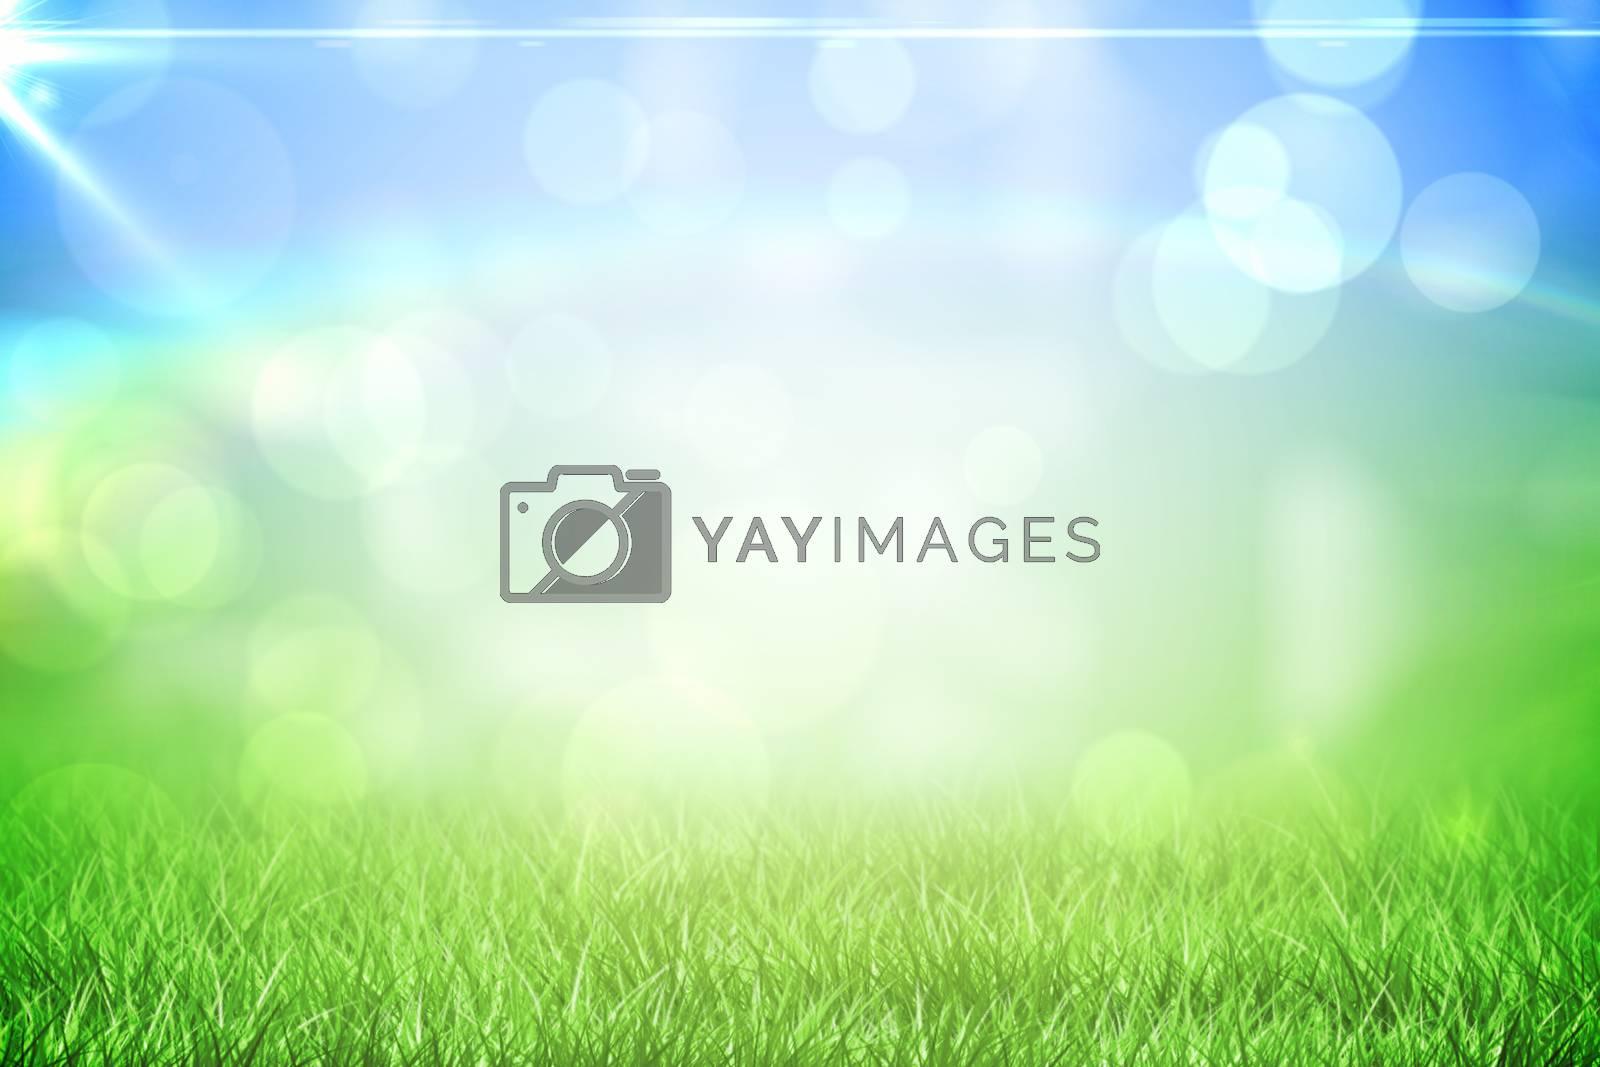 Royalty free image of Grass under a sunny sky by Wavebreakmedia